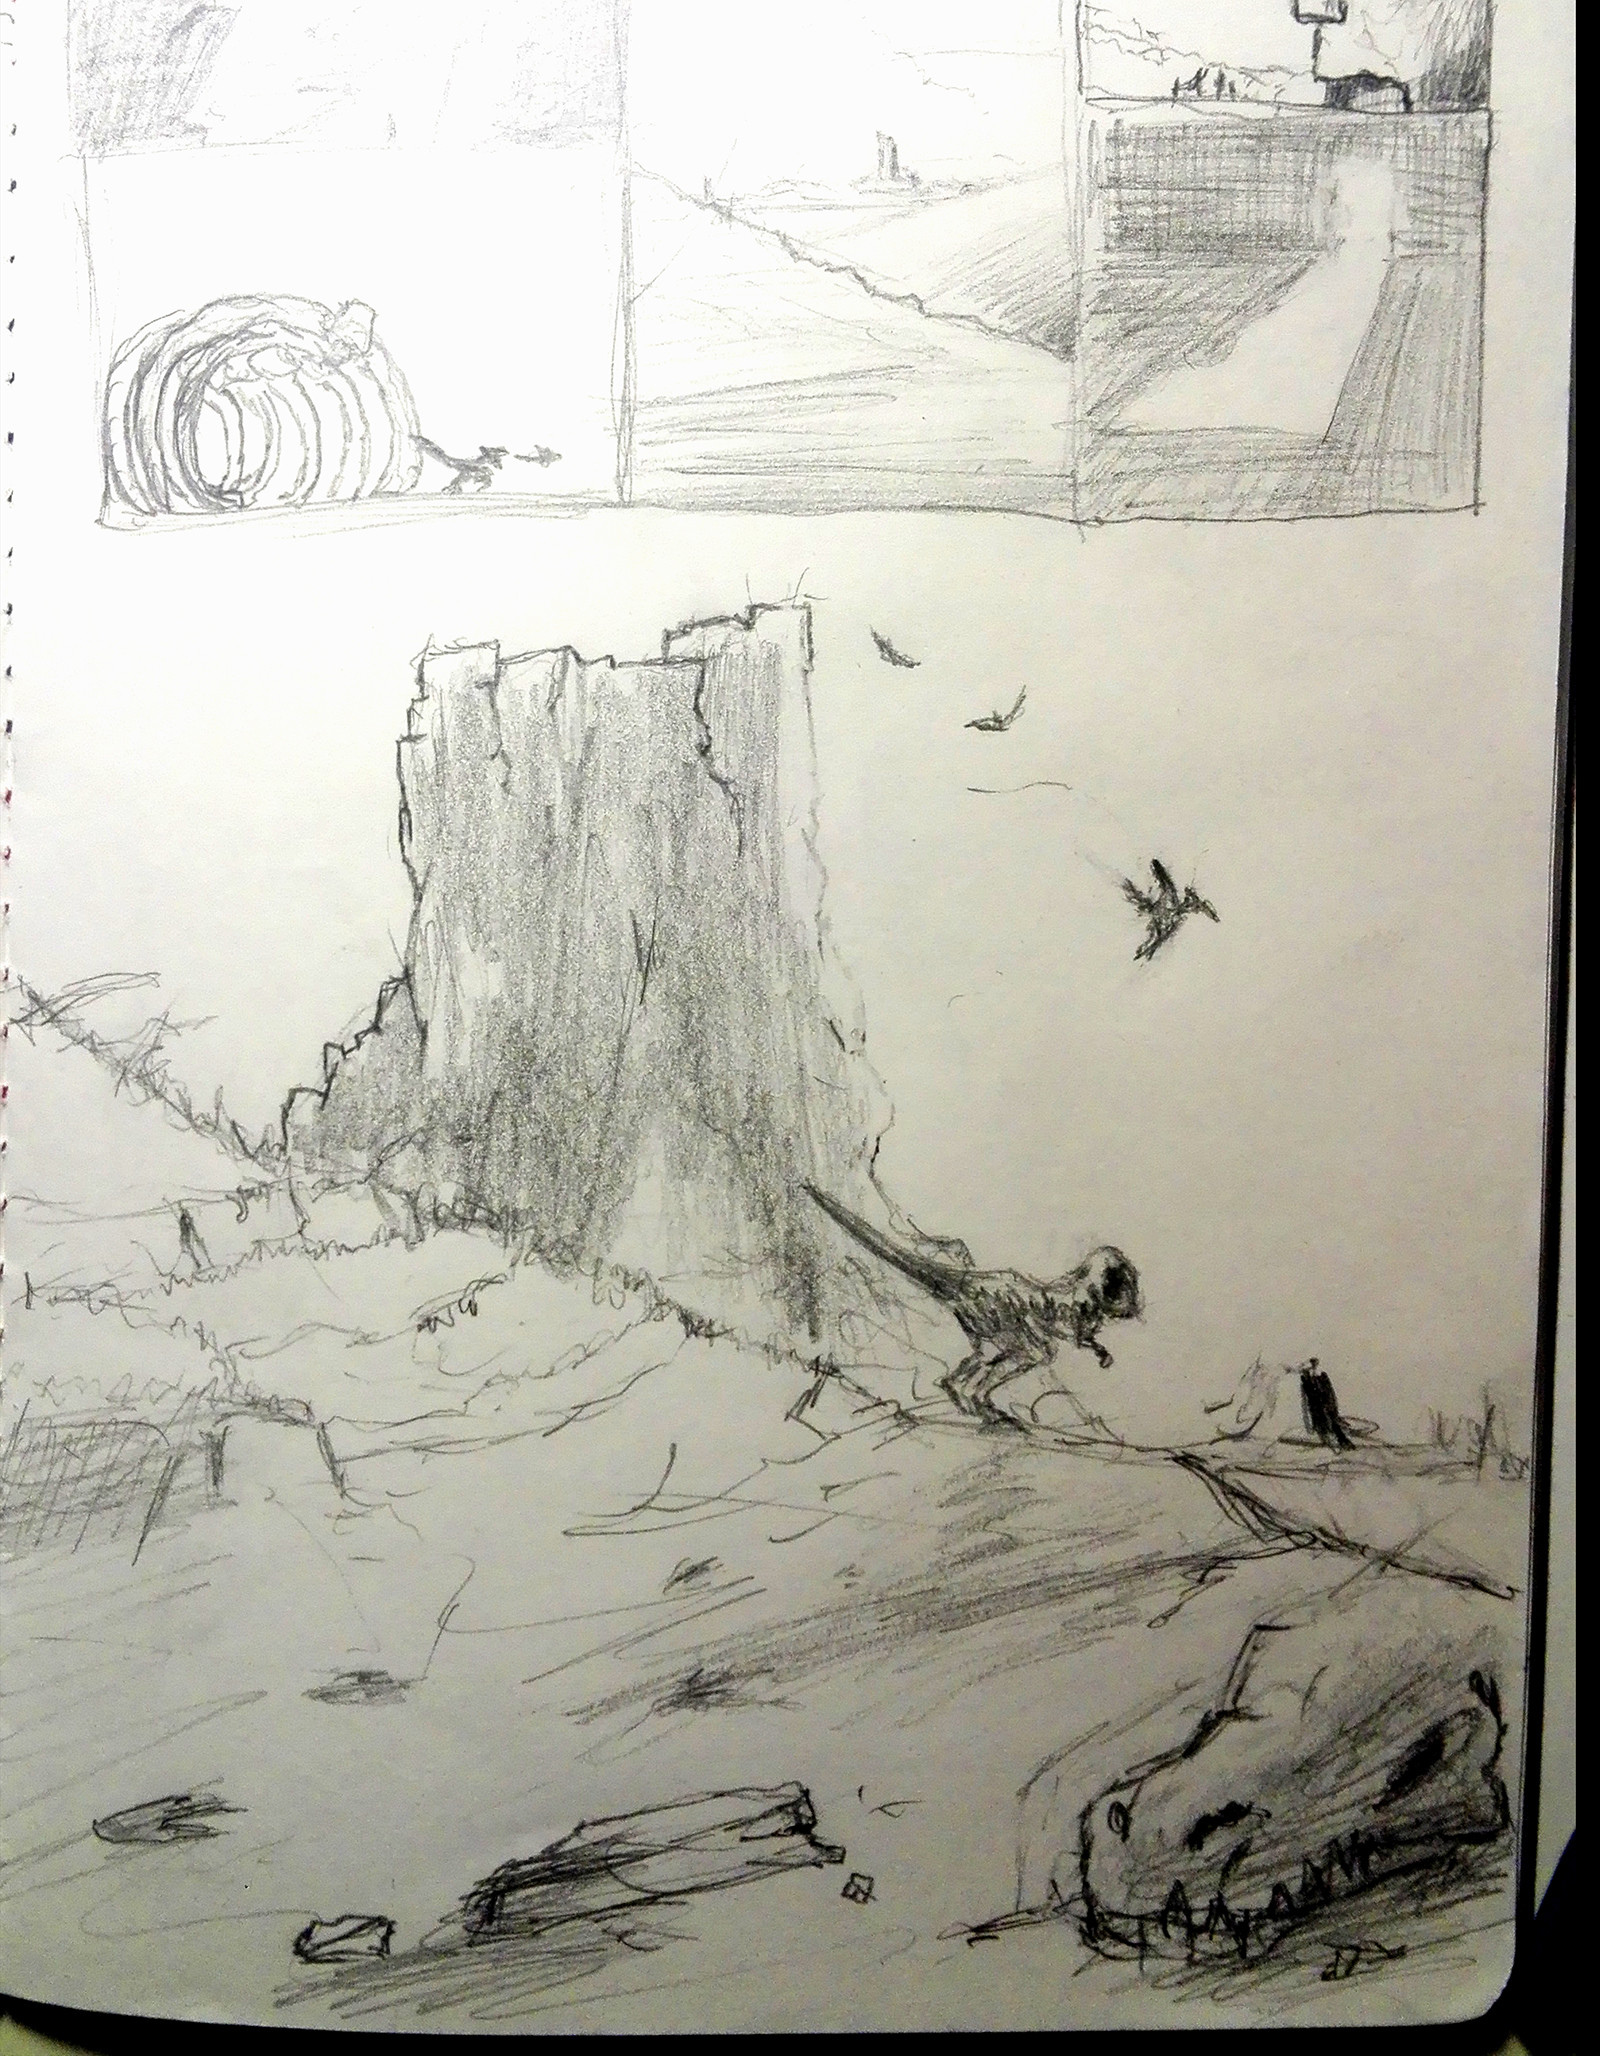 Martin jario jurassic sketch